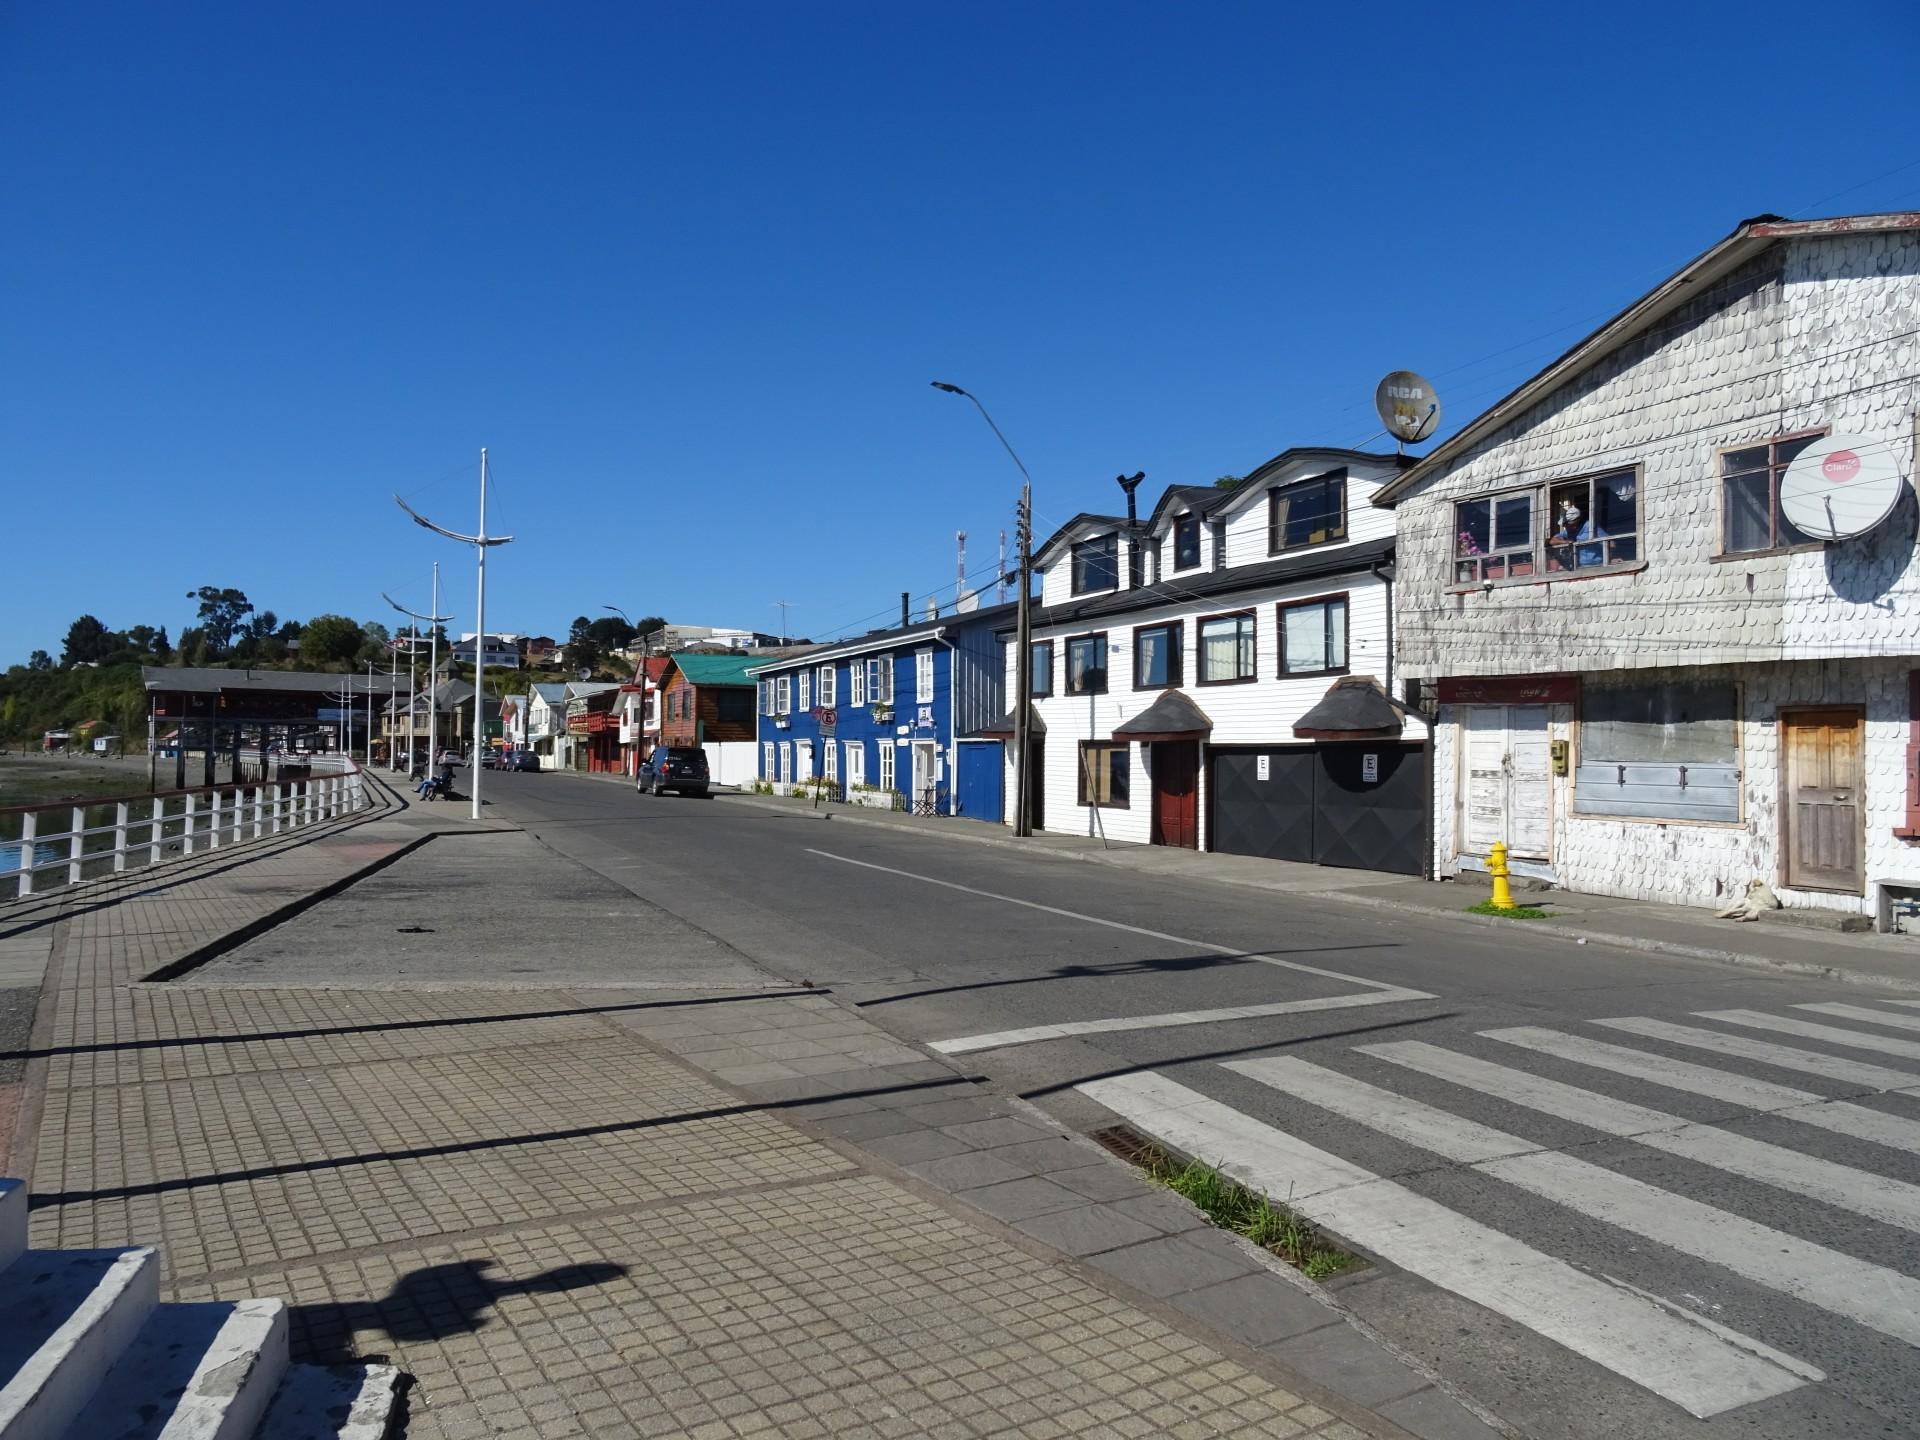 Chonchi seafront.